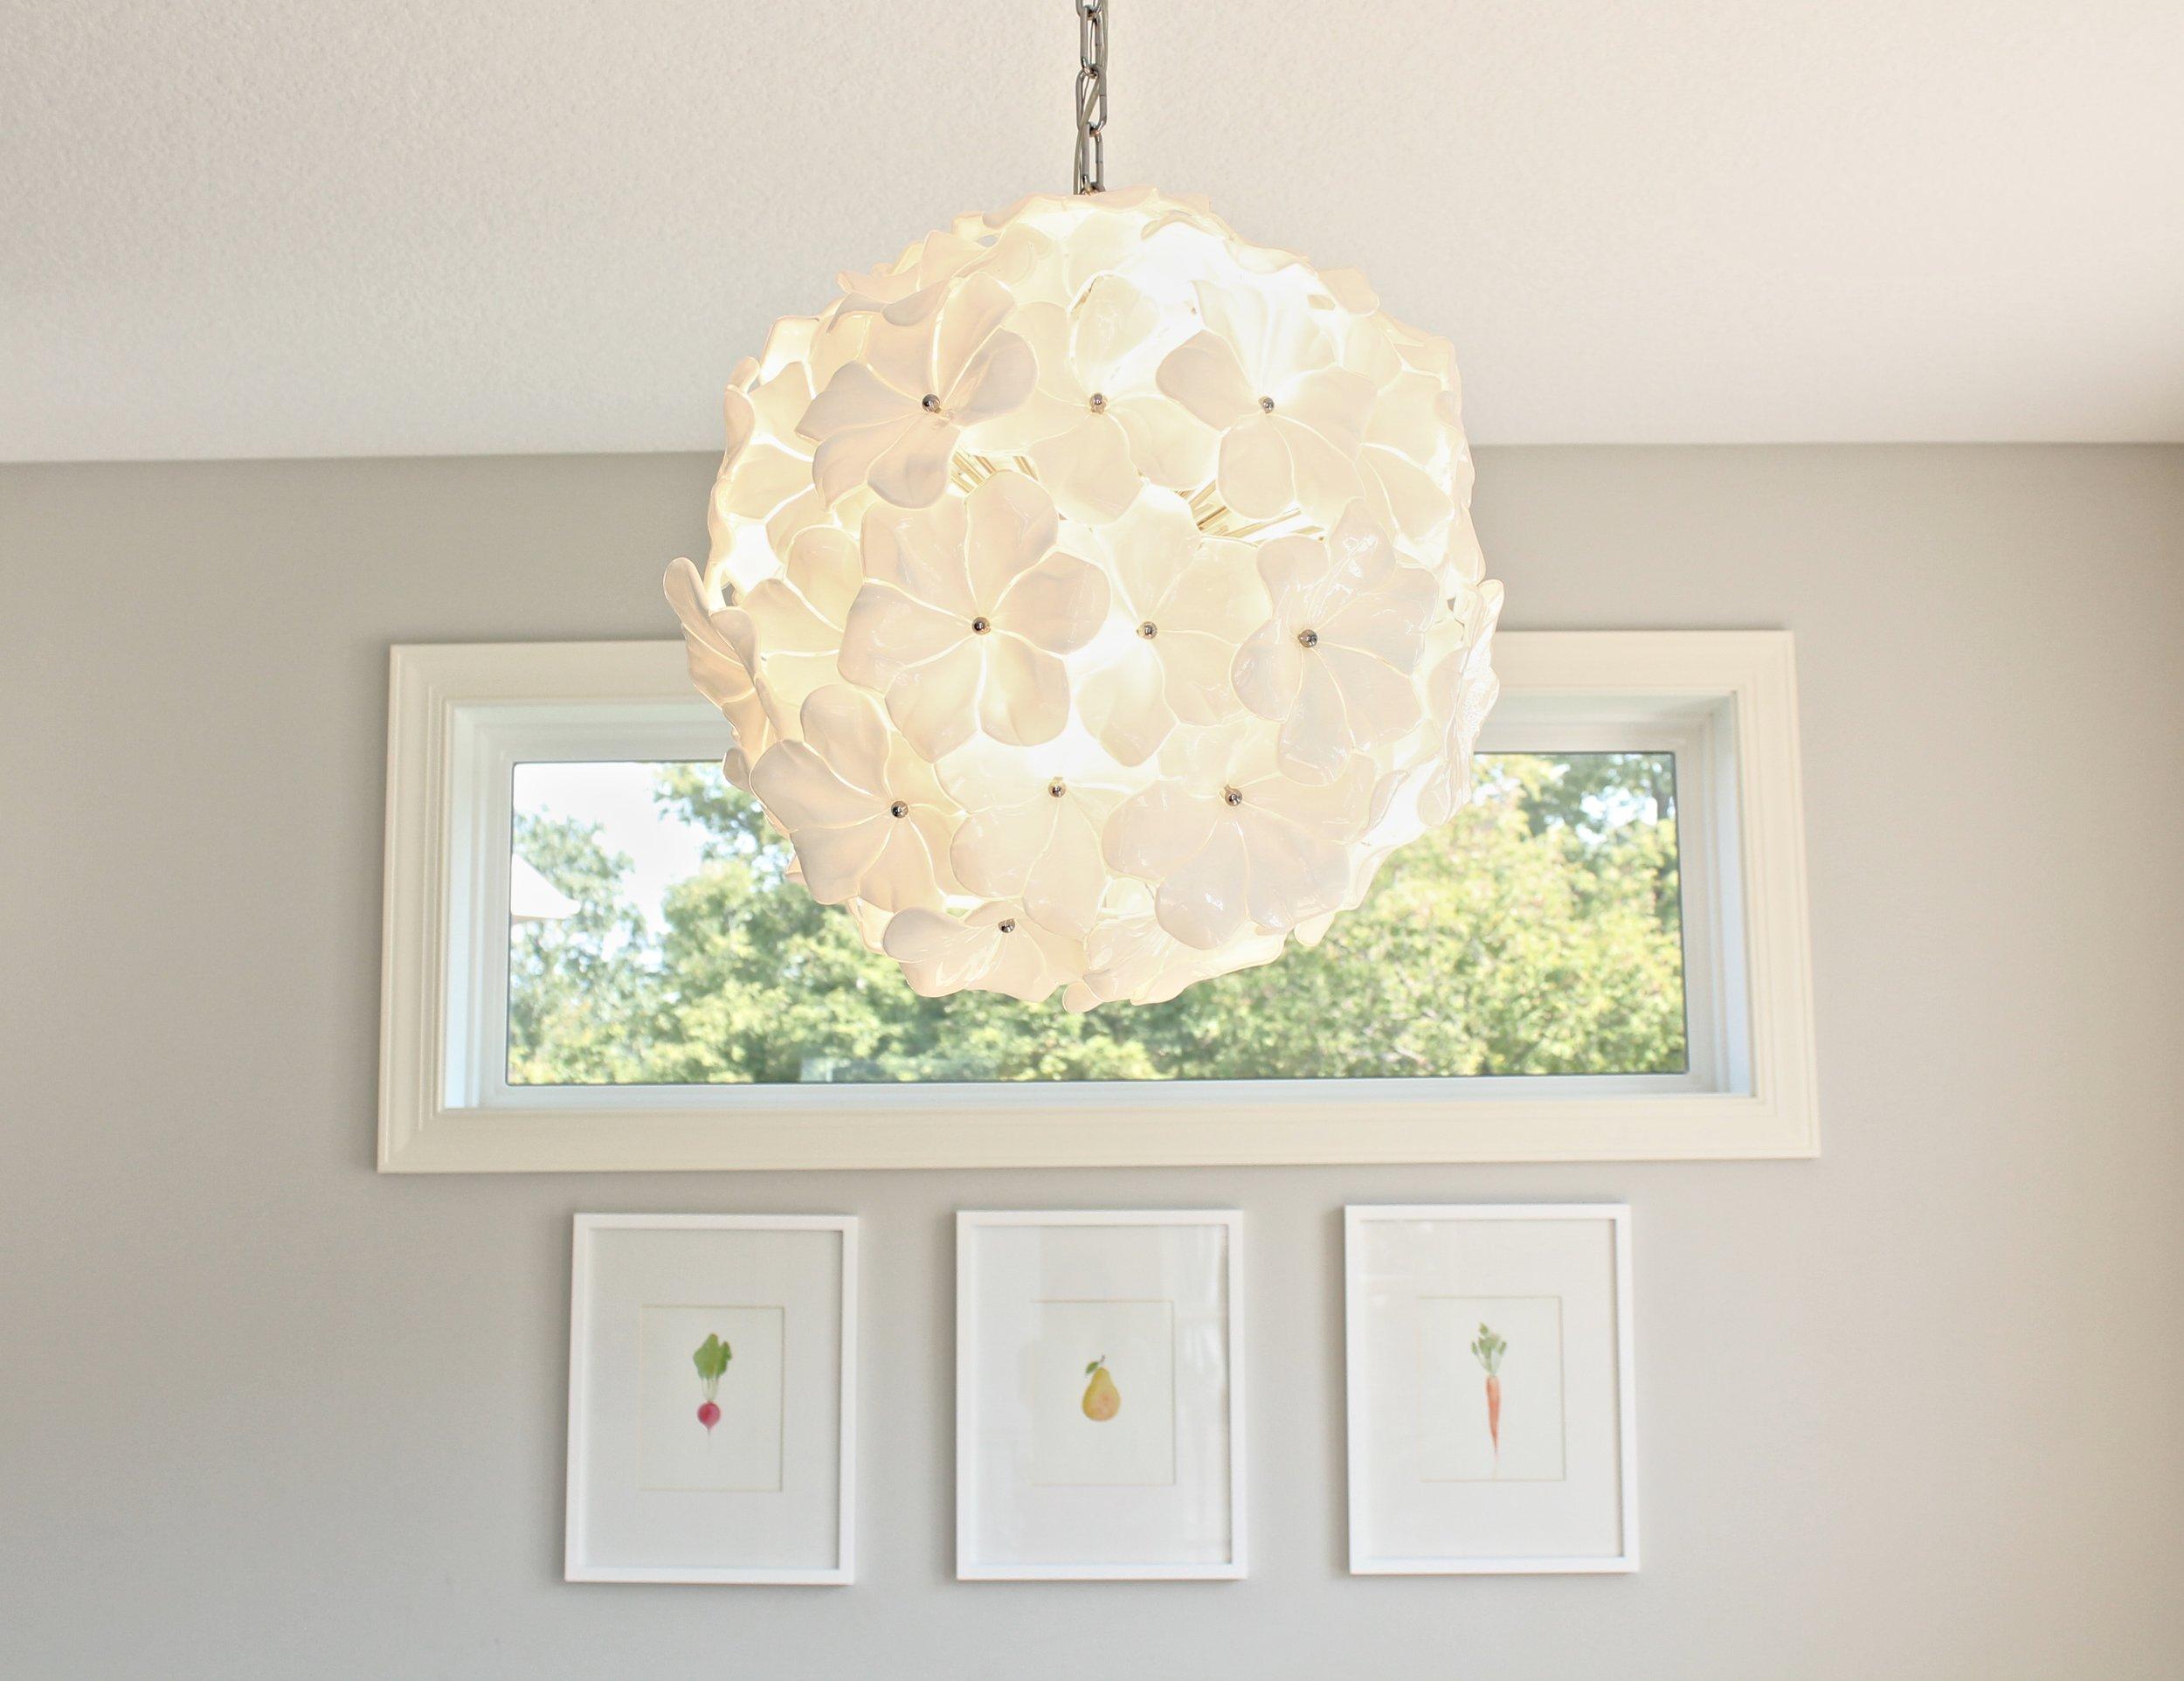 Murano glass chandelier. White flower chandelier. Venice chandelier.